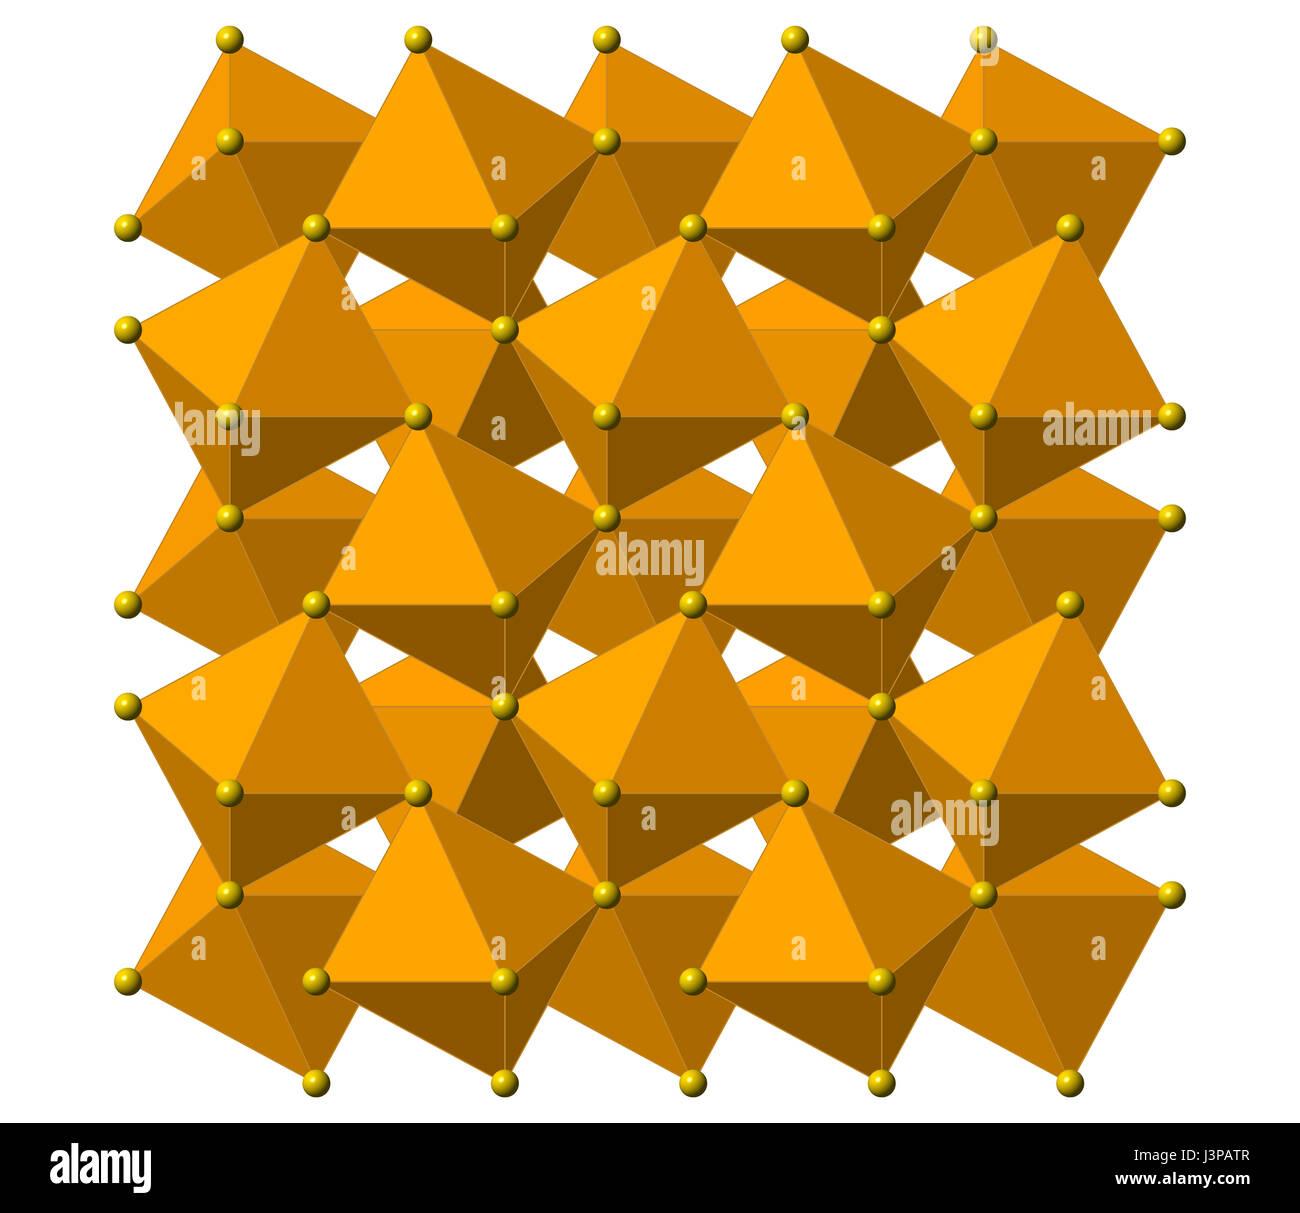 Pirita Oro Del Tonto Fe2s Una Estructura De Cristal